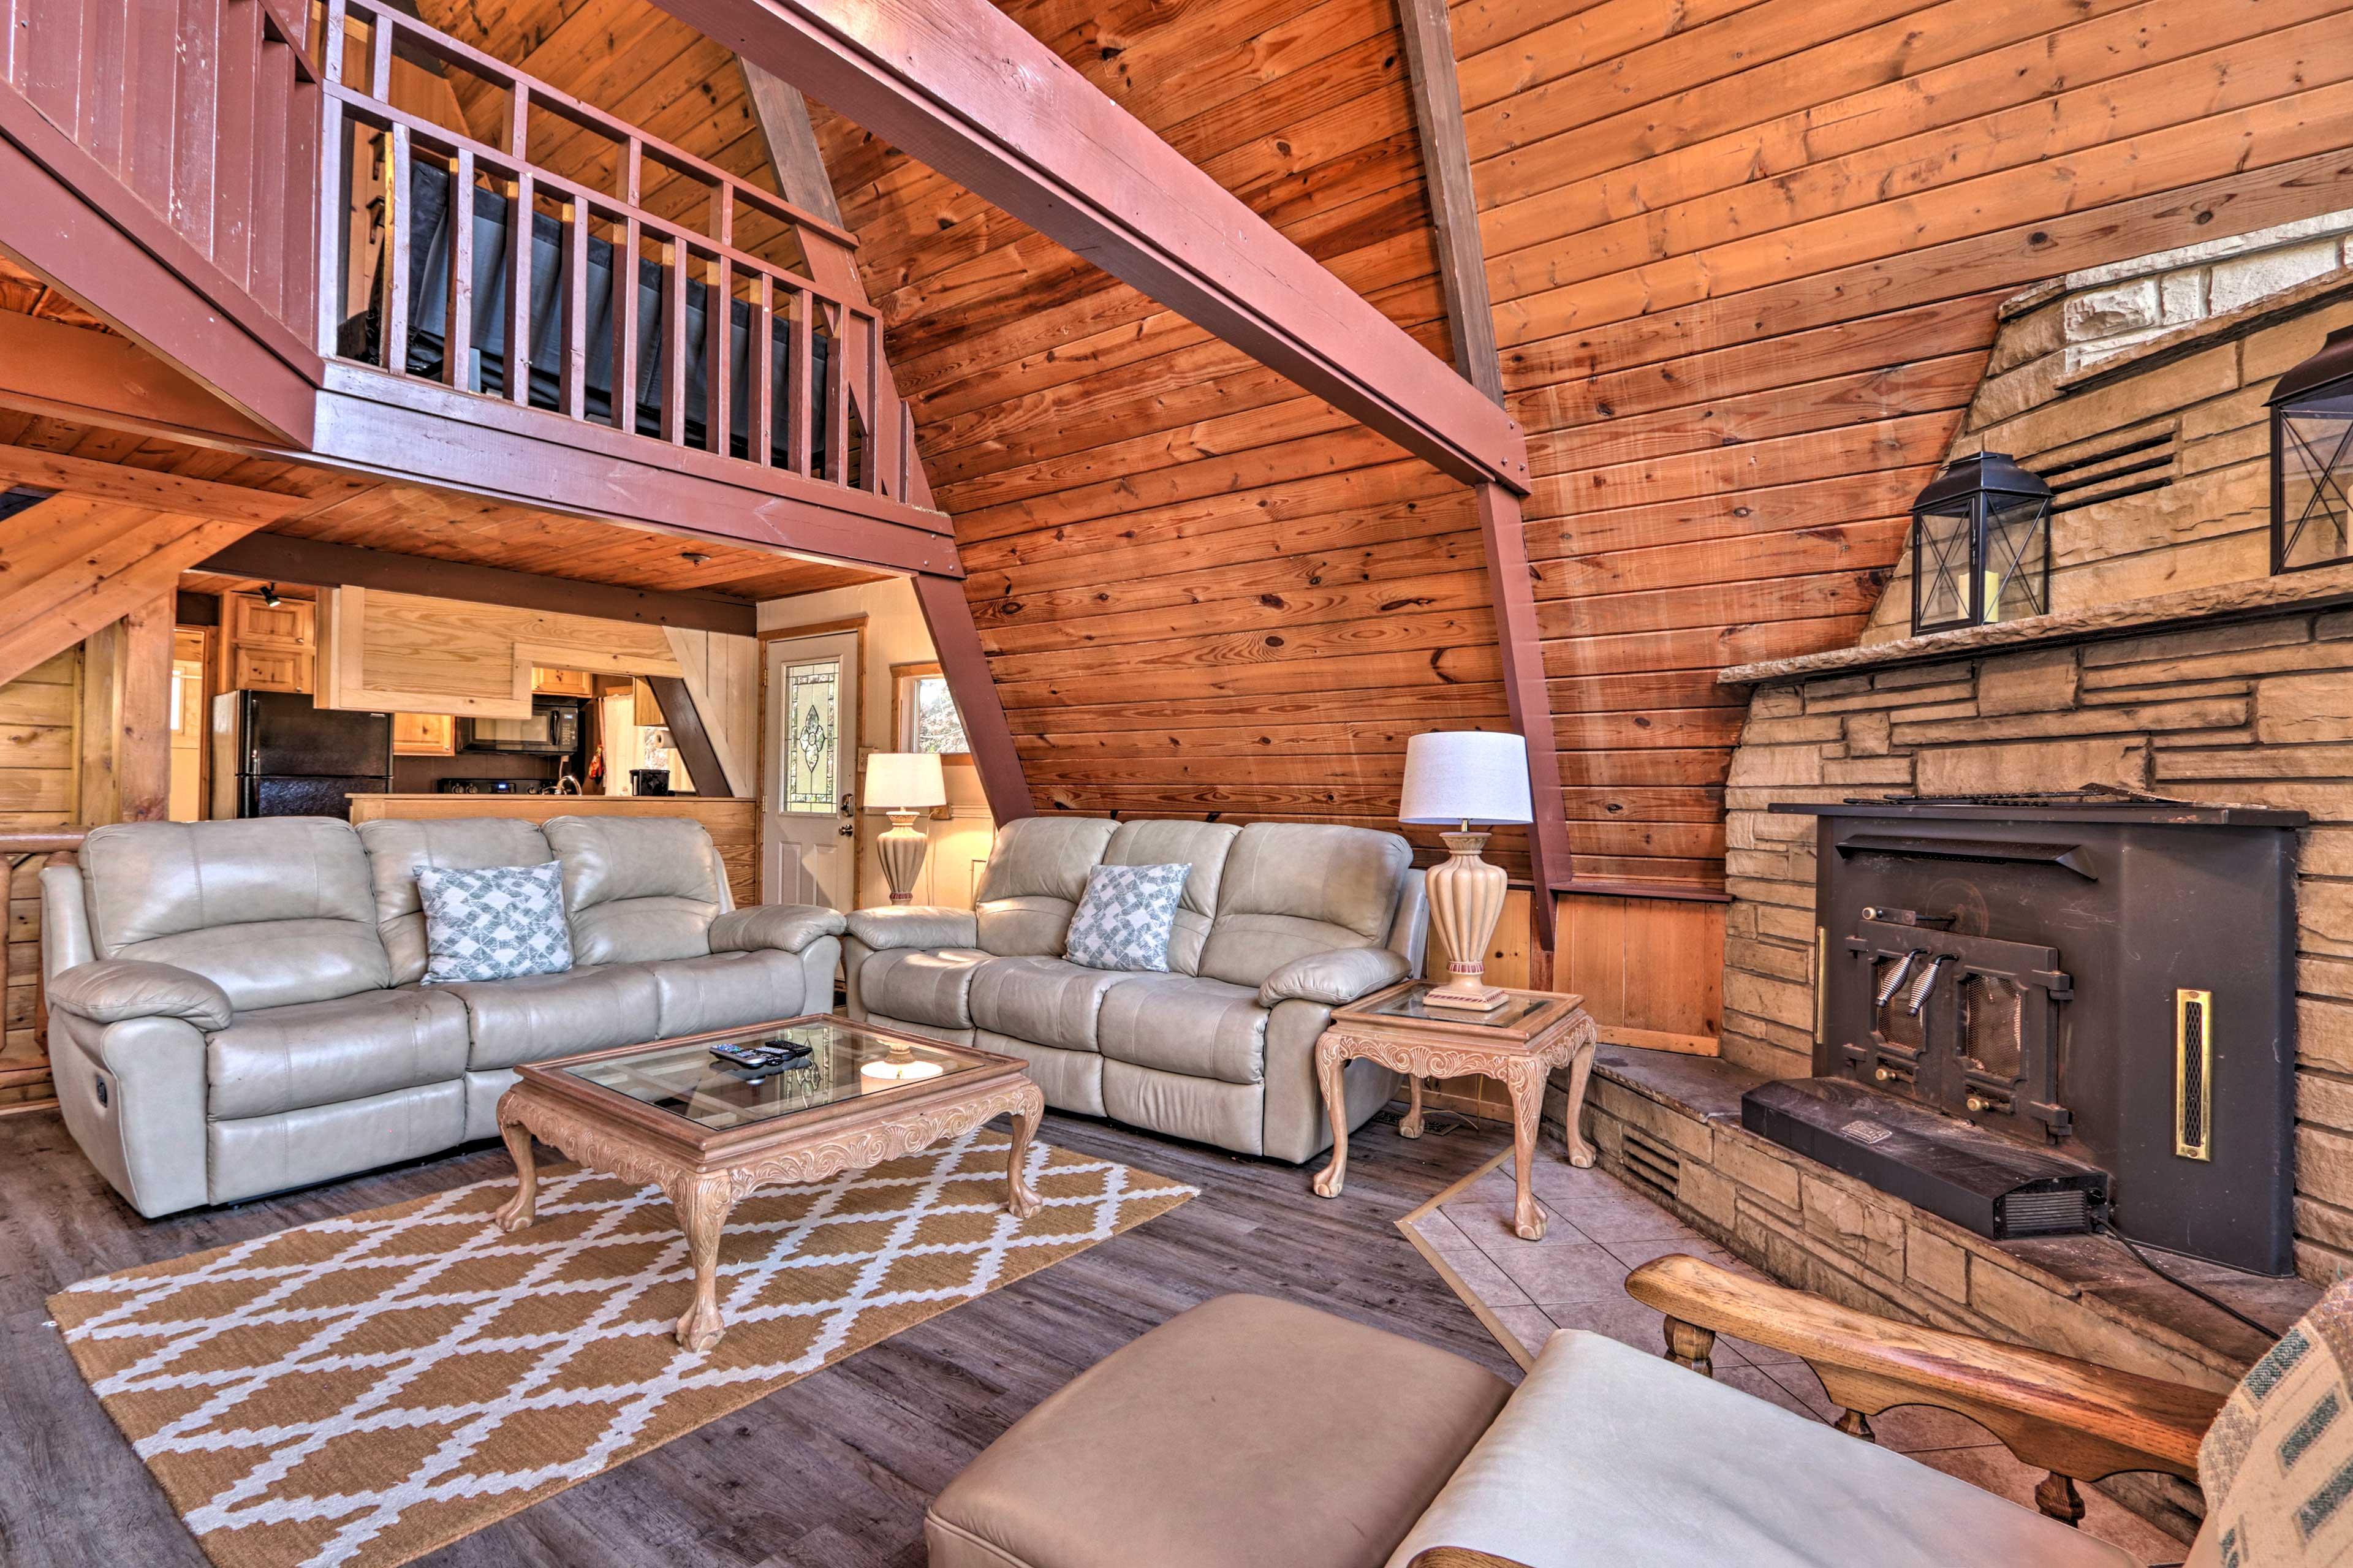 Property Interior | Open-Concept Living Area | Free WiFi